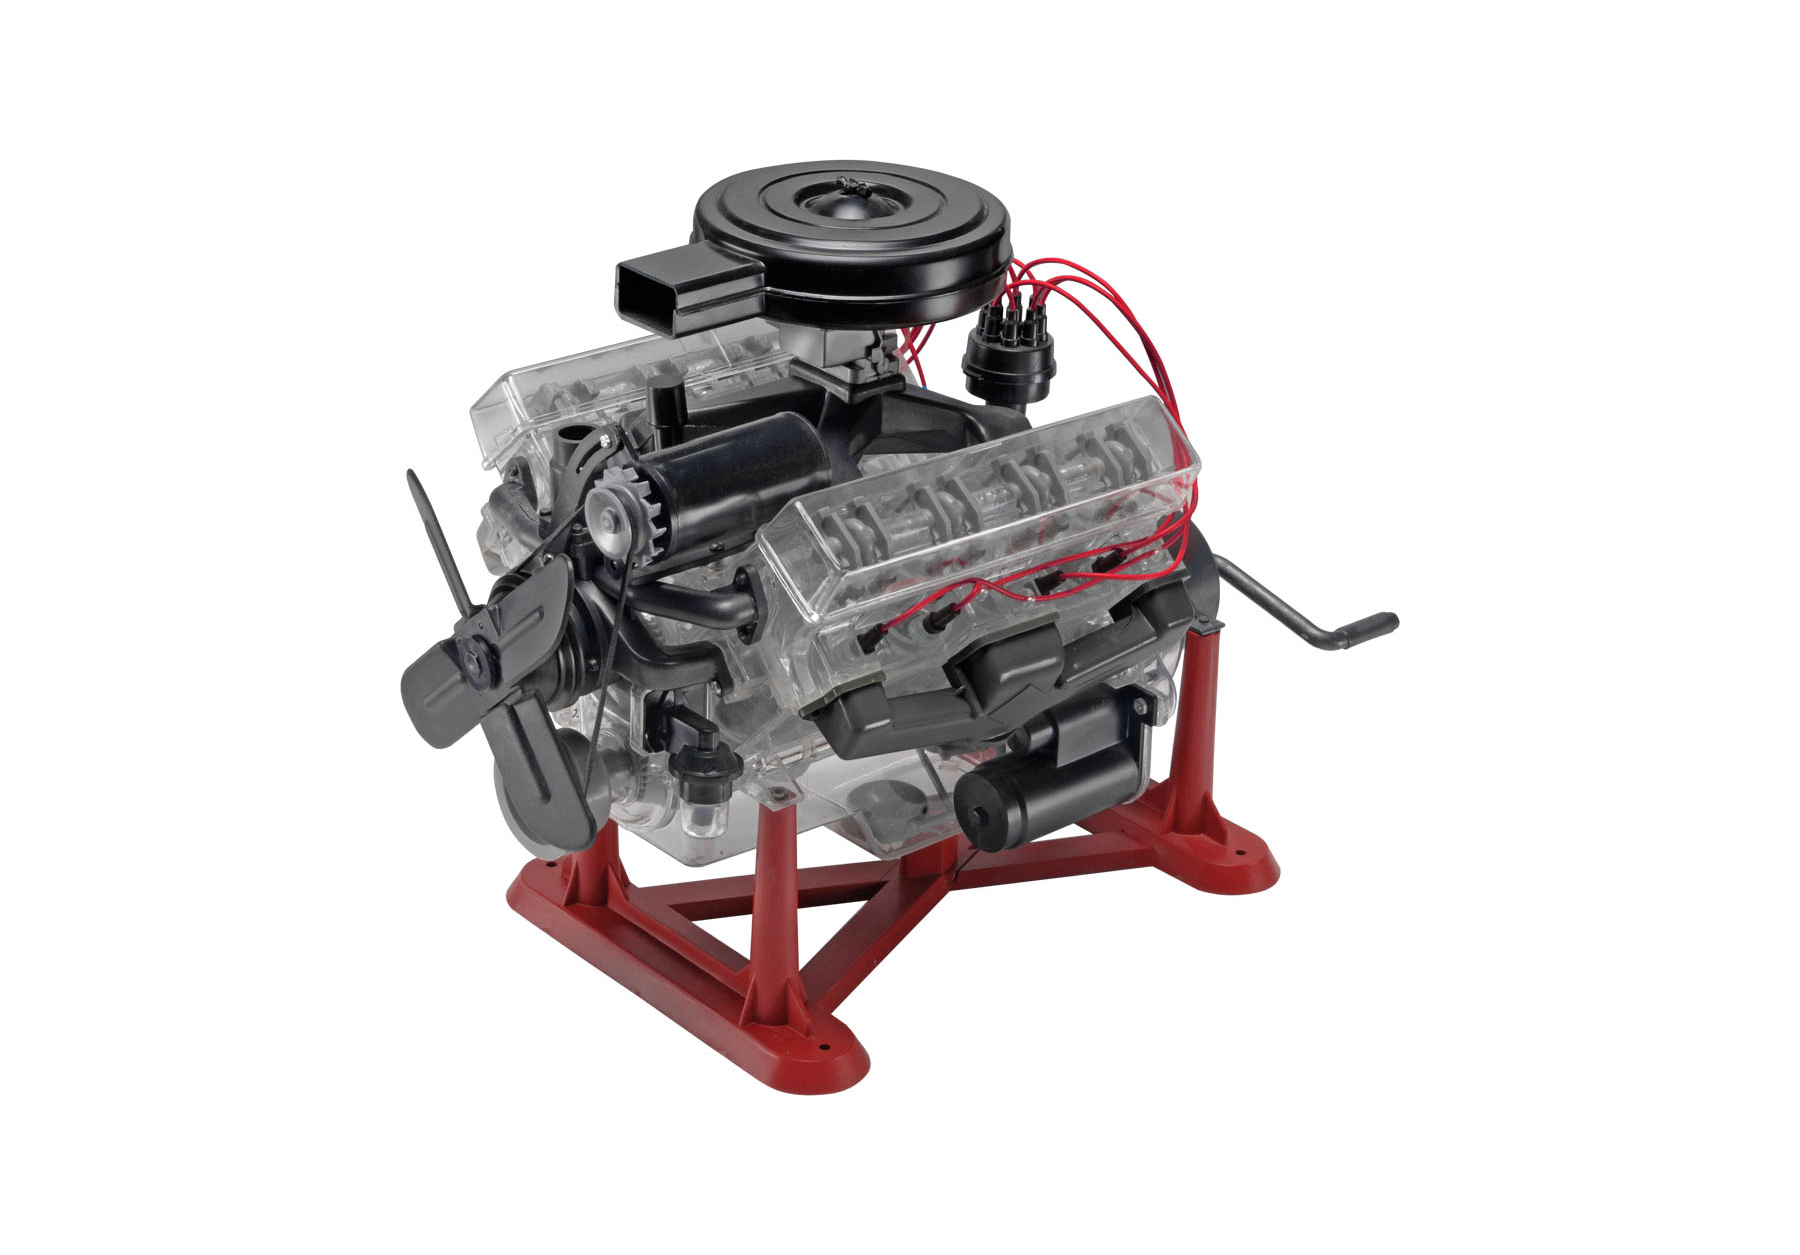 Revell 1 4 Scale Working V8 Model Engine